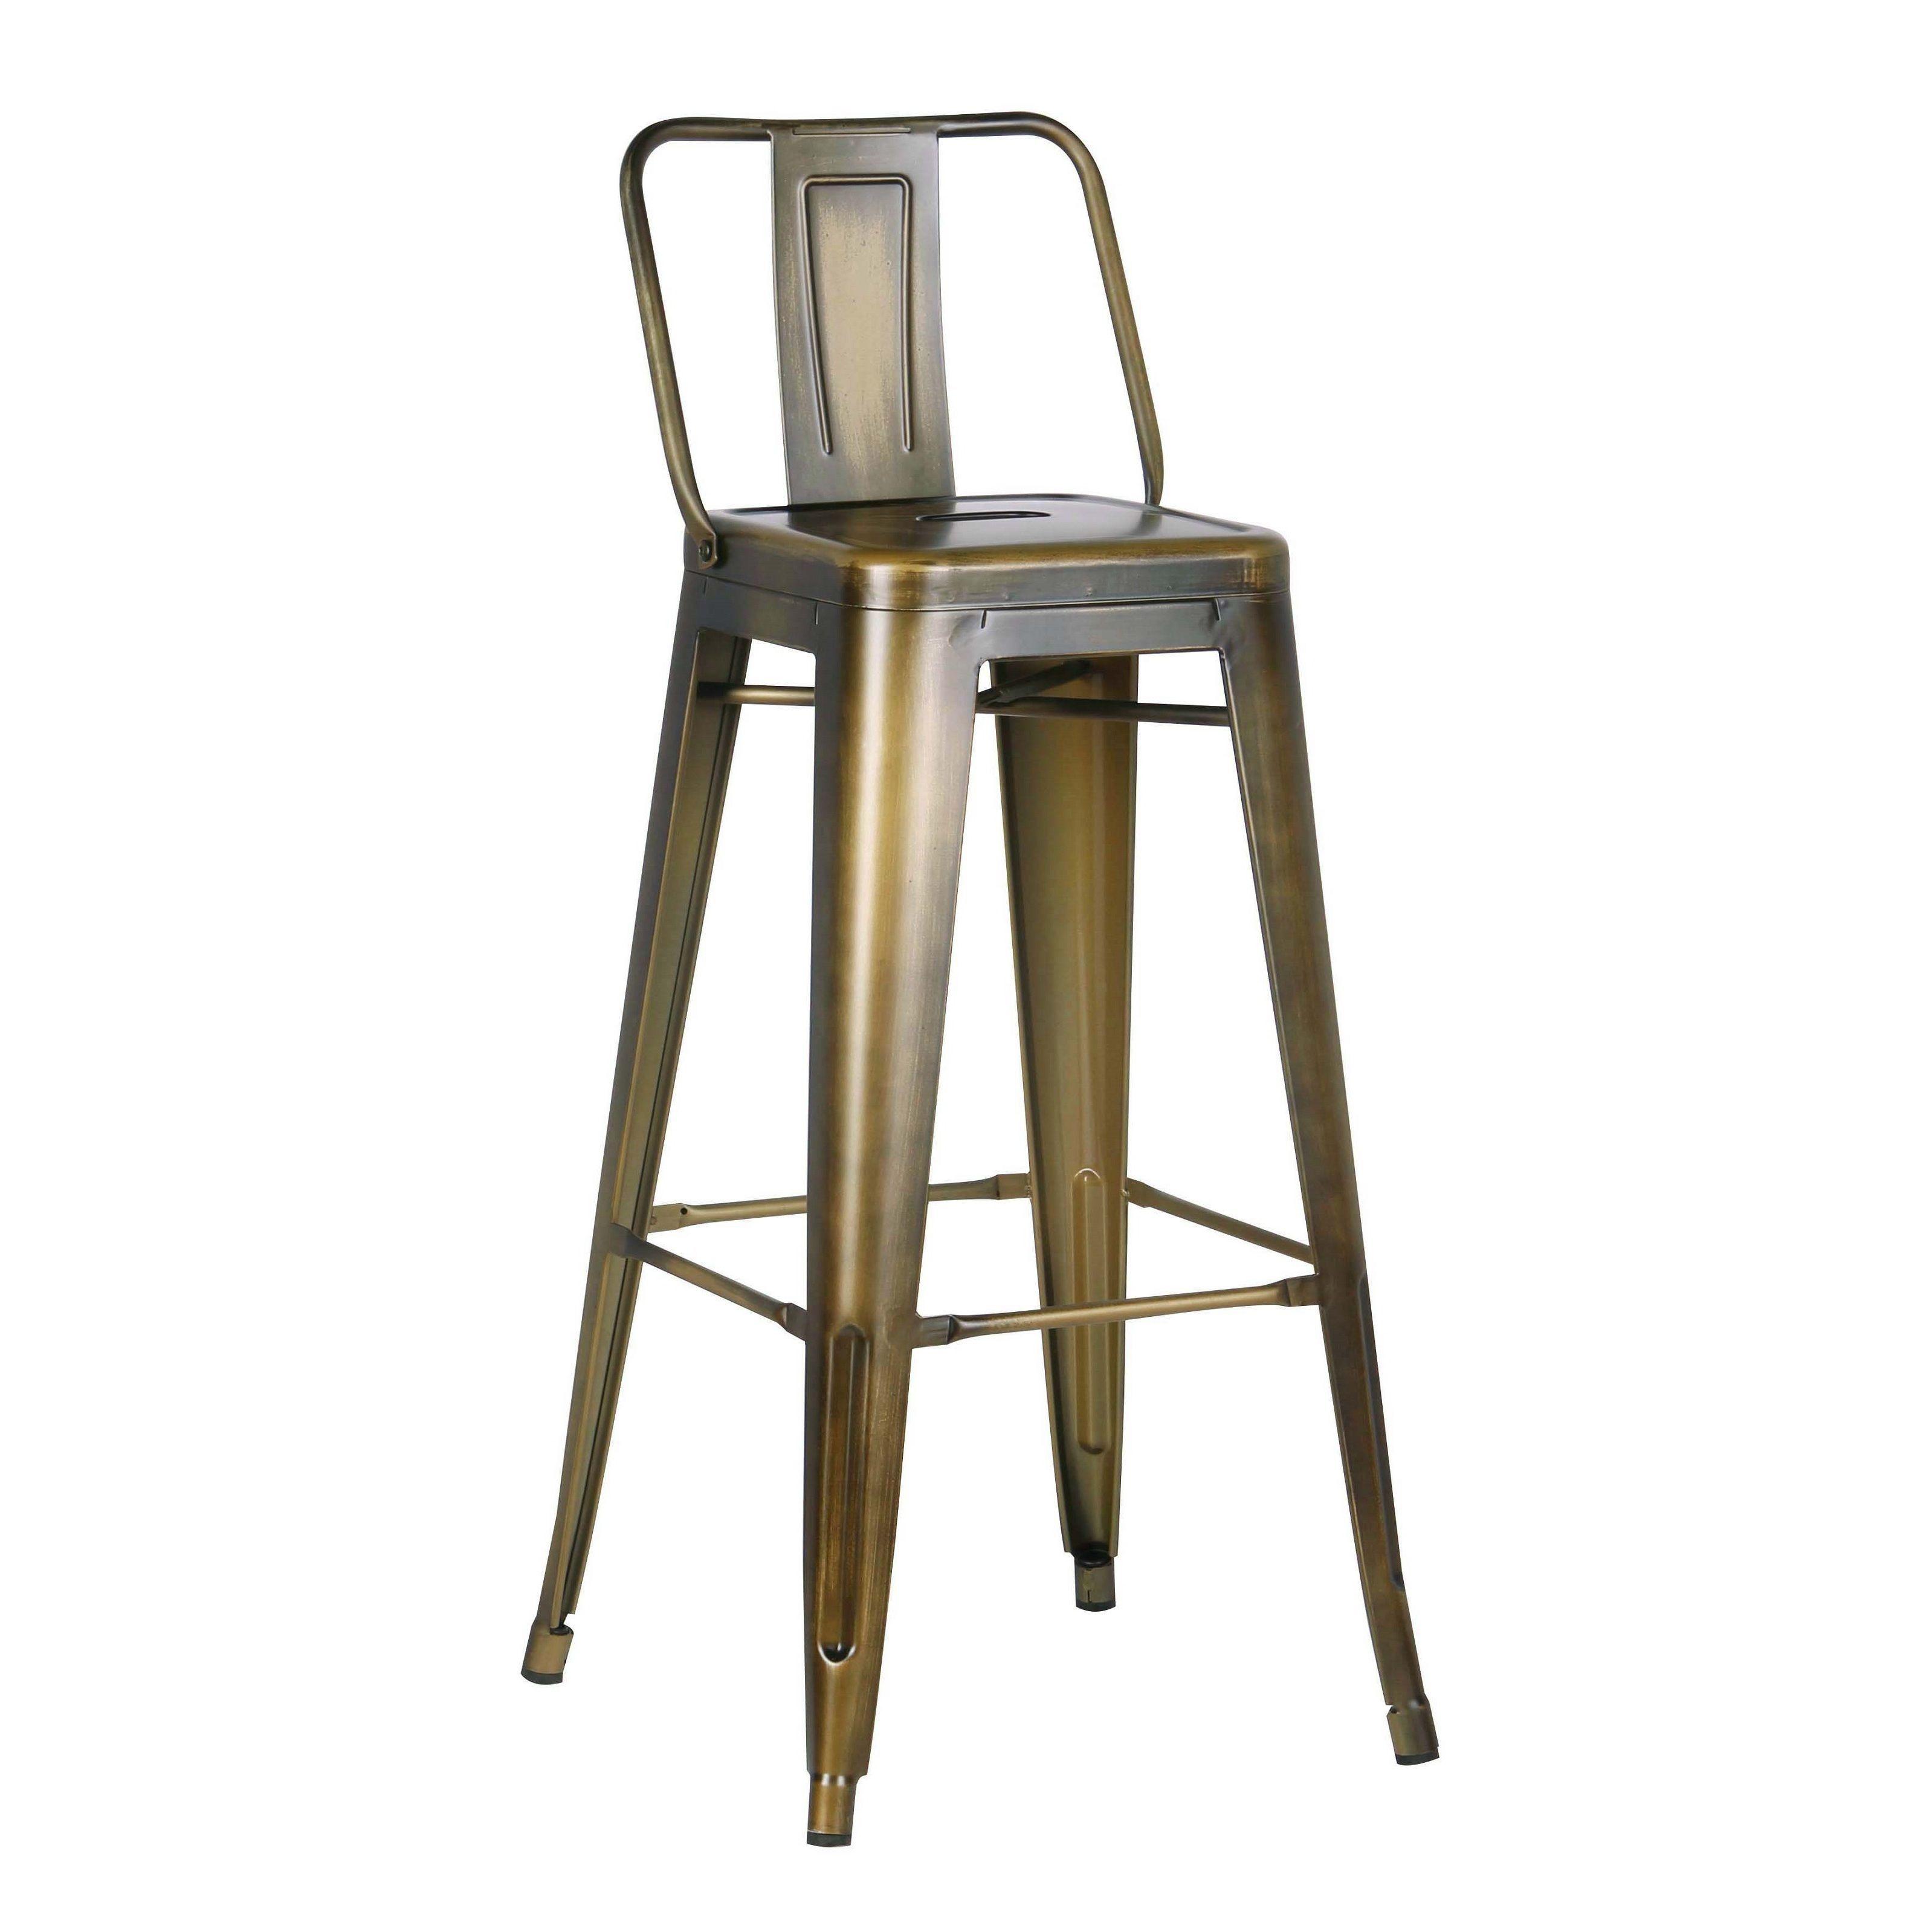 Peachy Ac Pacific Red Black Gold Distressed Metal 30 Inch Barstool Creativecarmelina Interior Chair Design Creativecarmelinacom